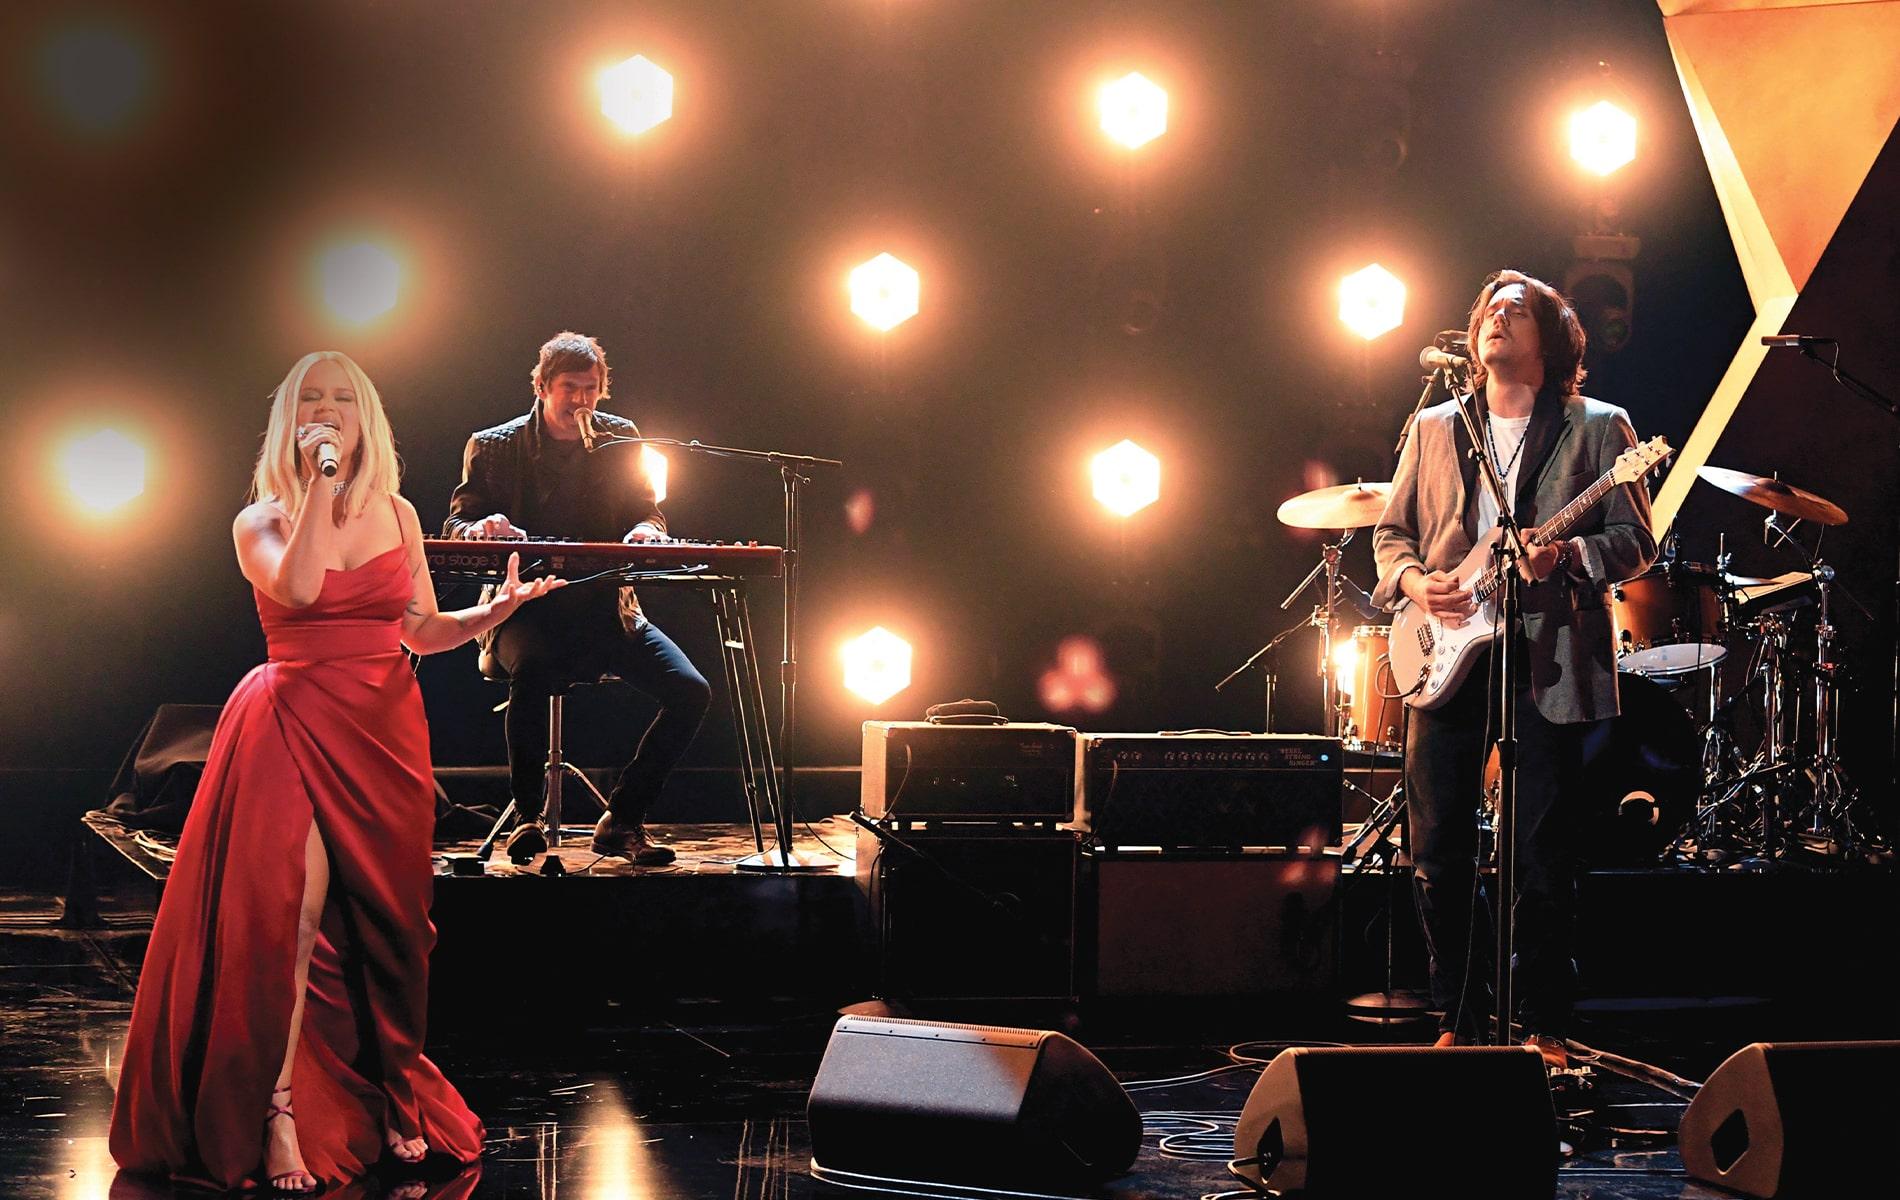 Maren Morris, John Mayer, 63rd Annual Grammy Awards, Los Angeles Convention Center, The Recording Academy